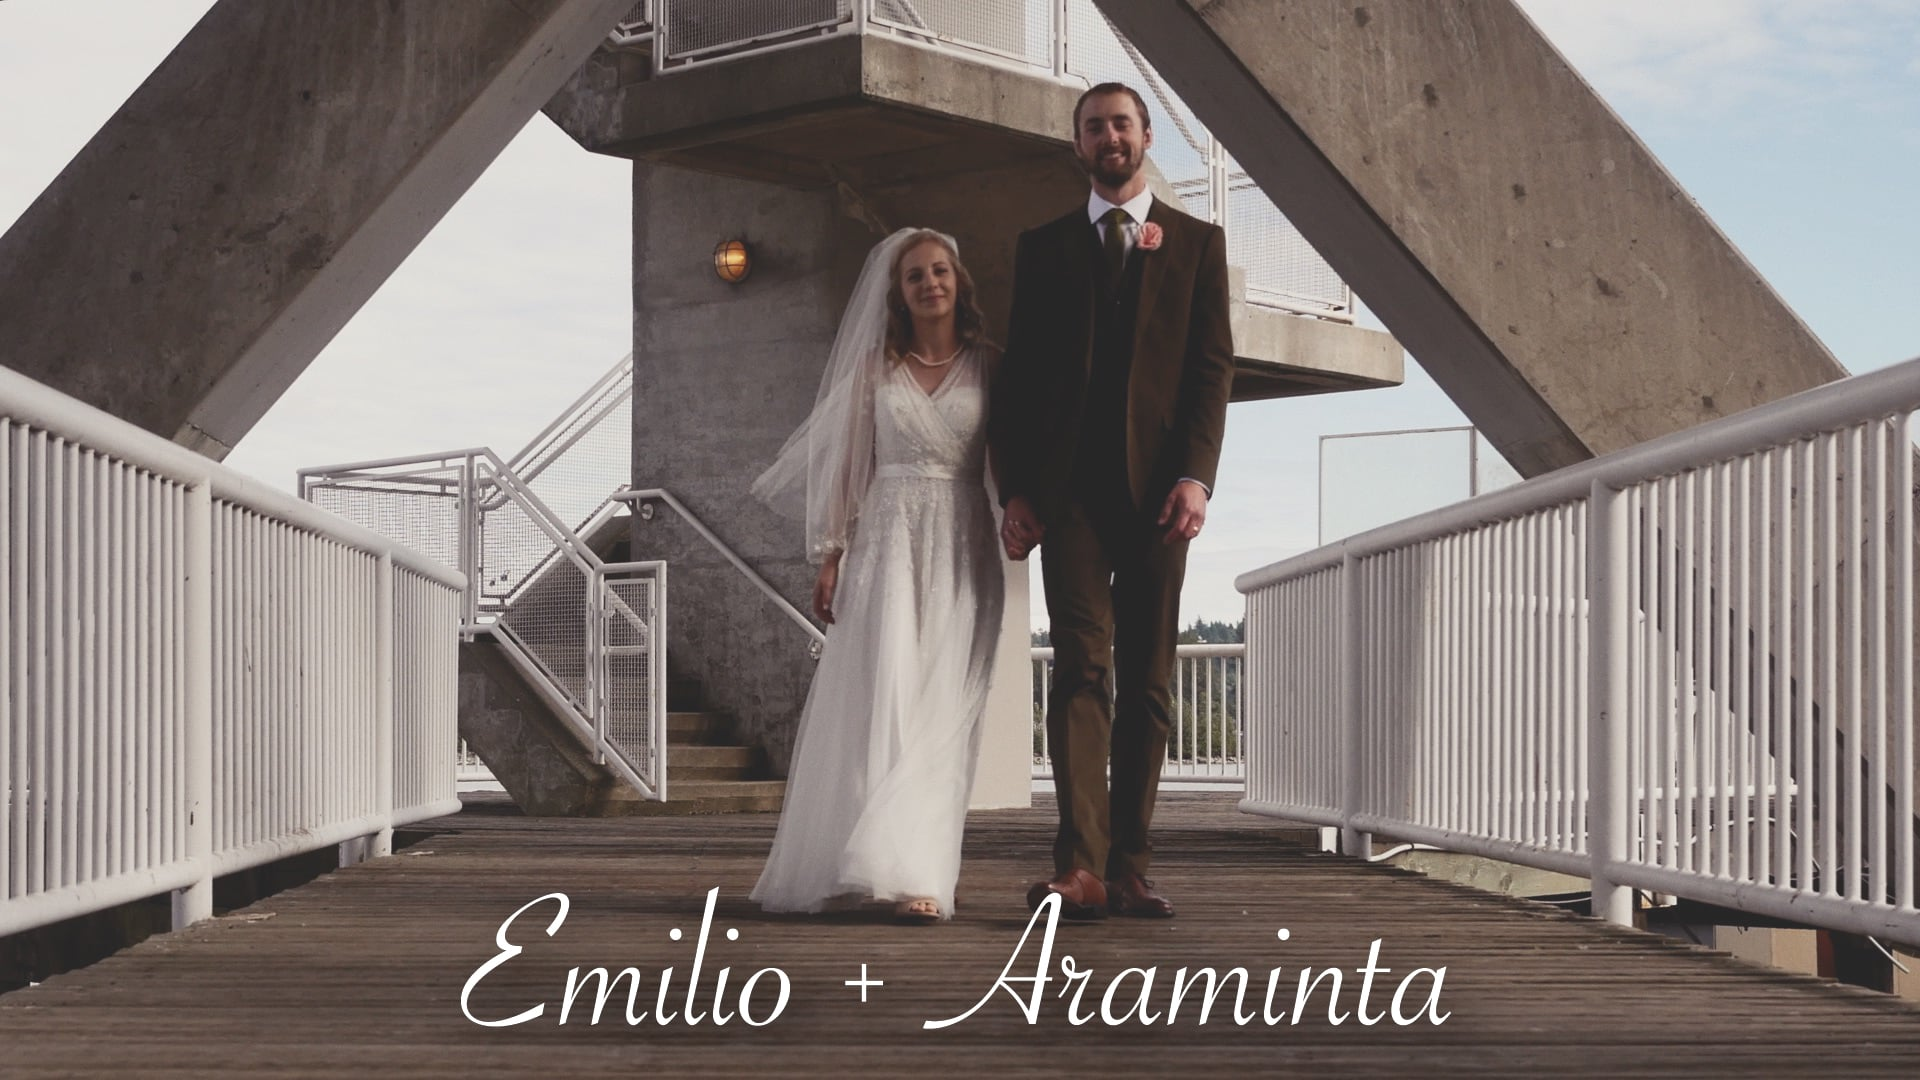 Emilio and Araminta's Riverboat Wedding